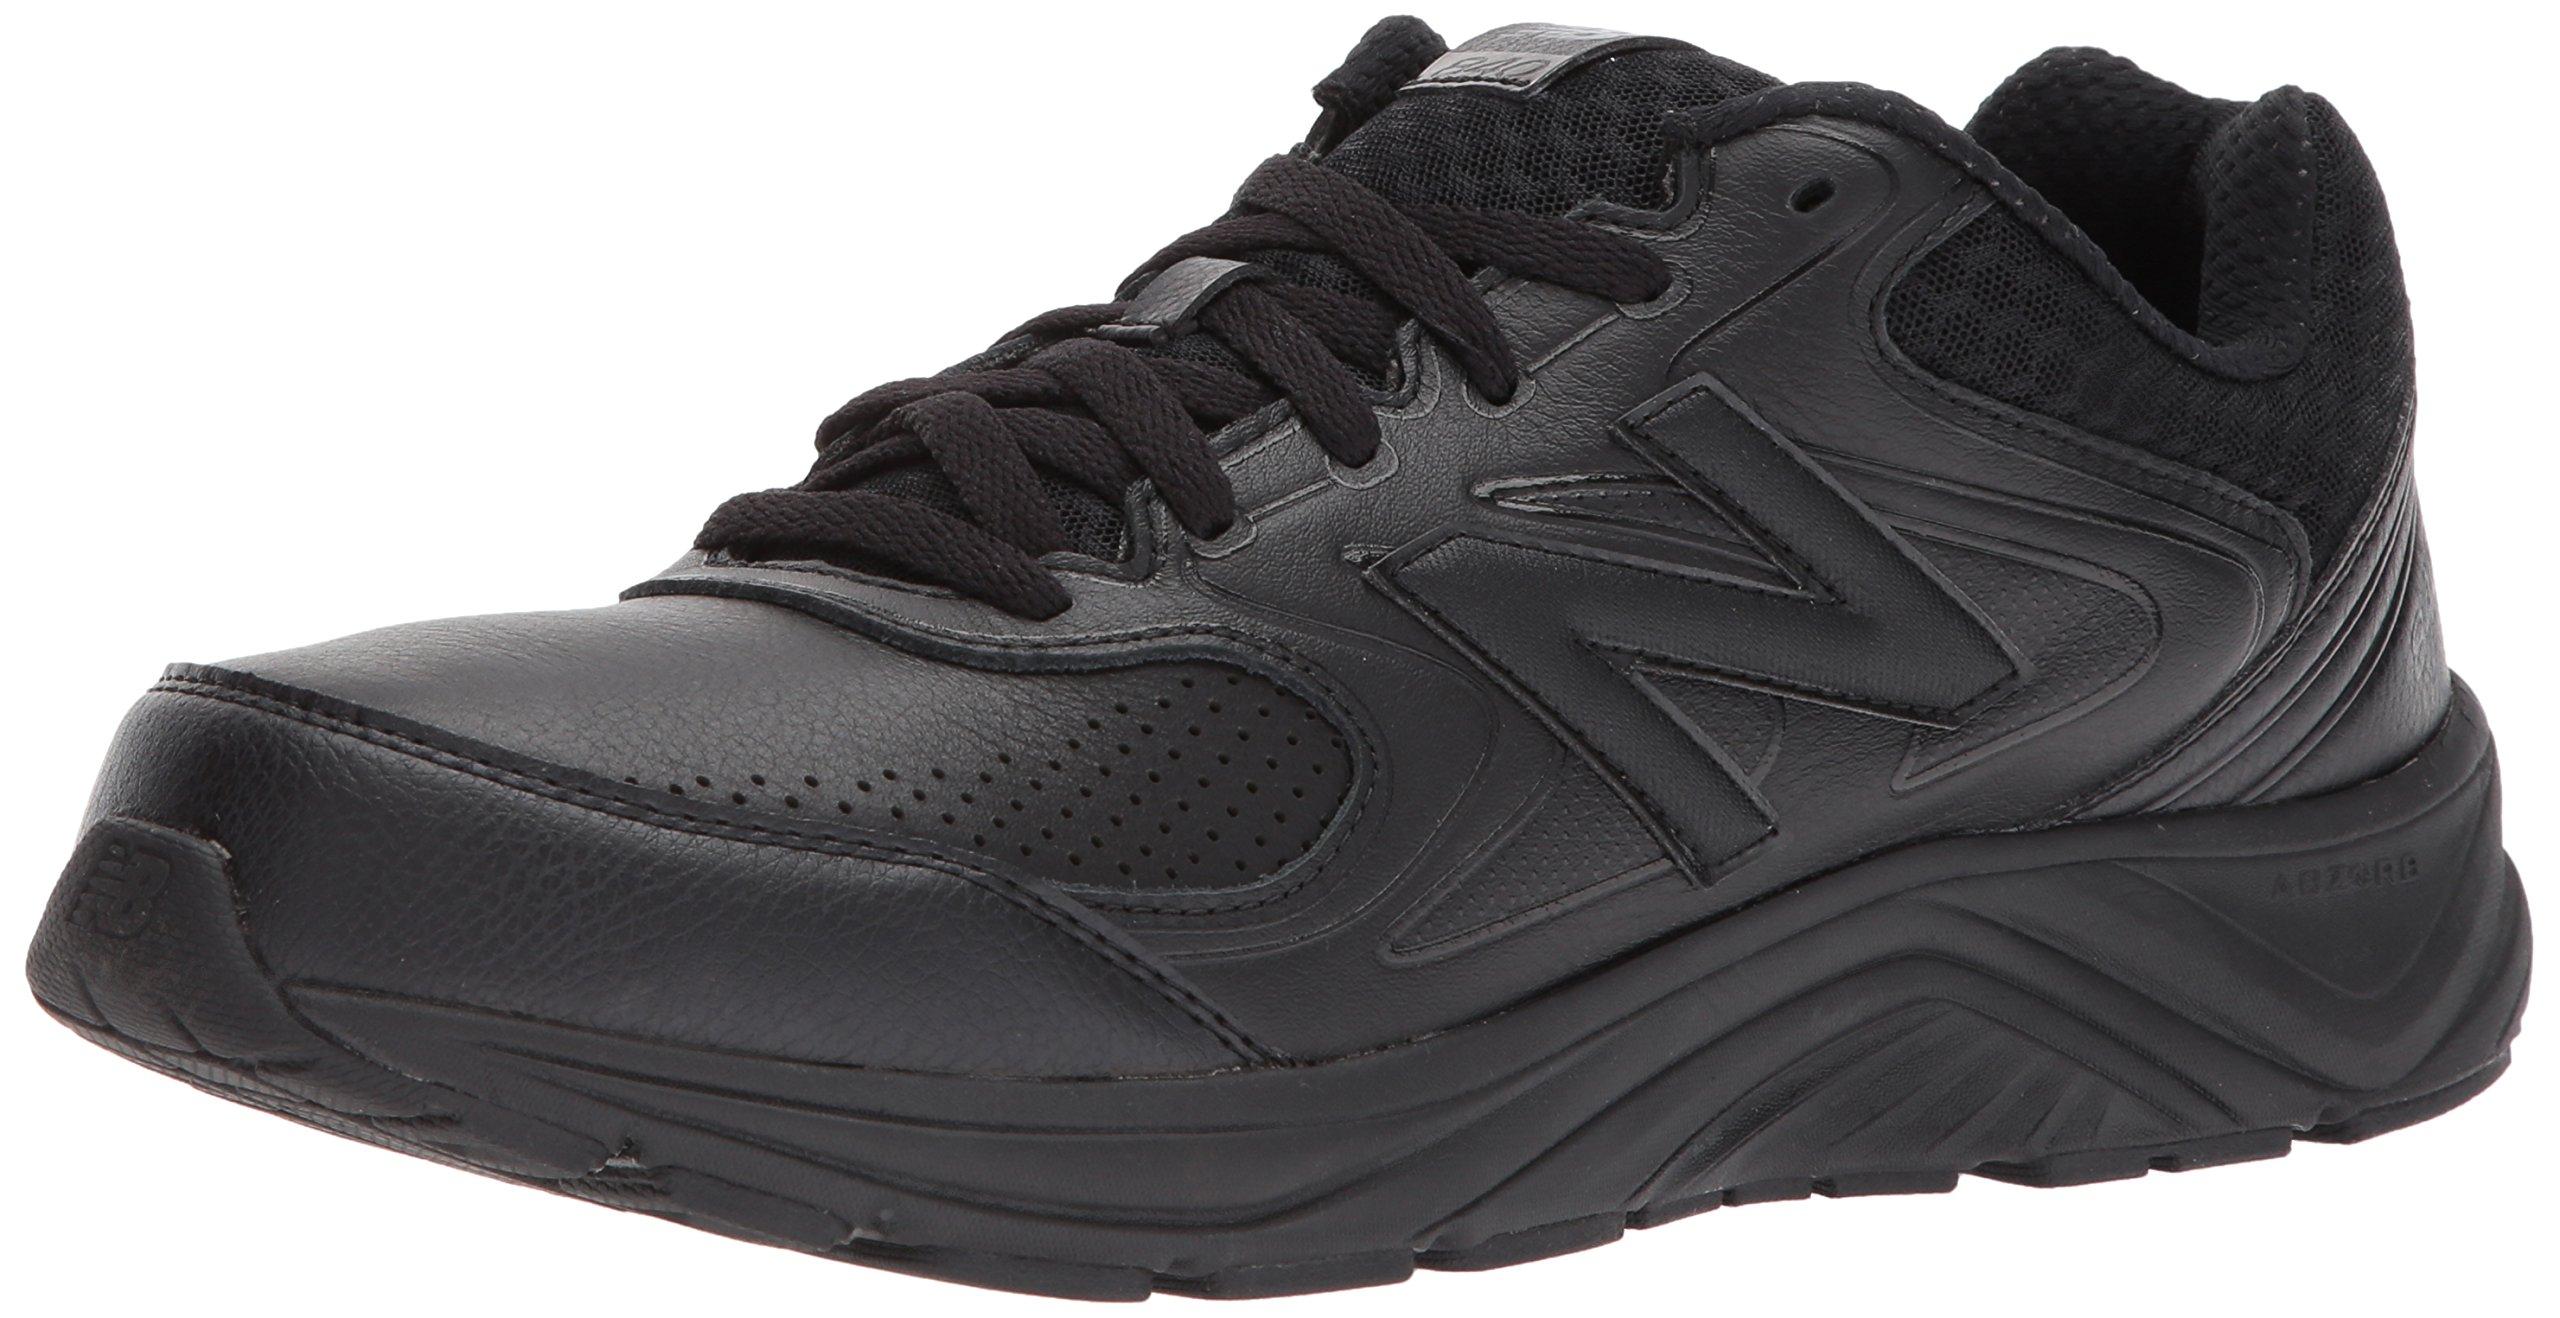 New Balance Men's MW840v2 Walking Shoe, Black/Black, 14 2E US by New Balance